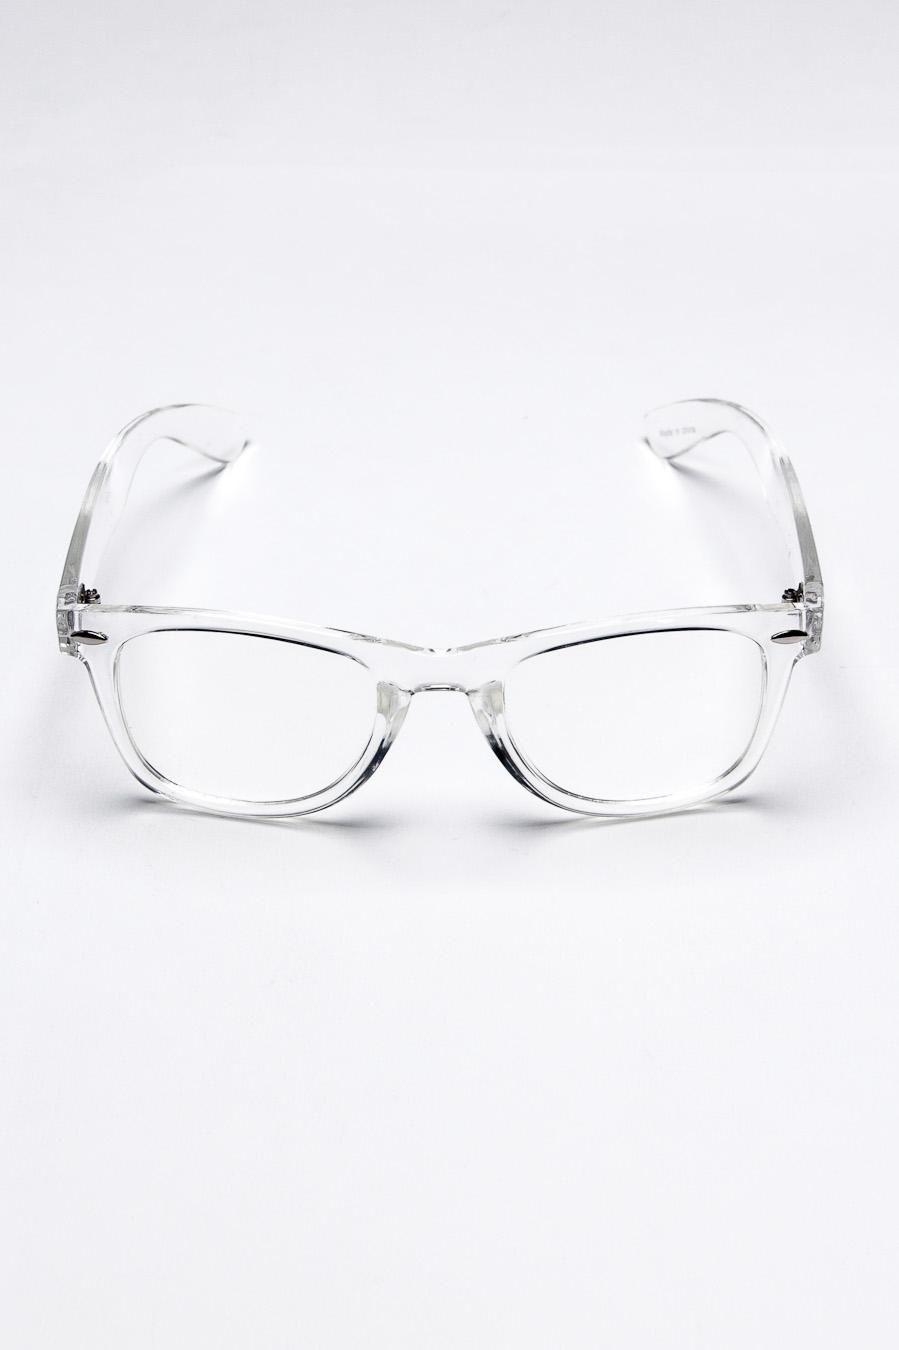 Clear-framed glasses. | Four Eyes | Pinterest | Glass, Eyewear and ...